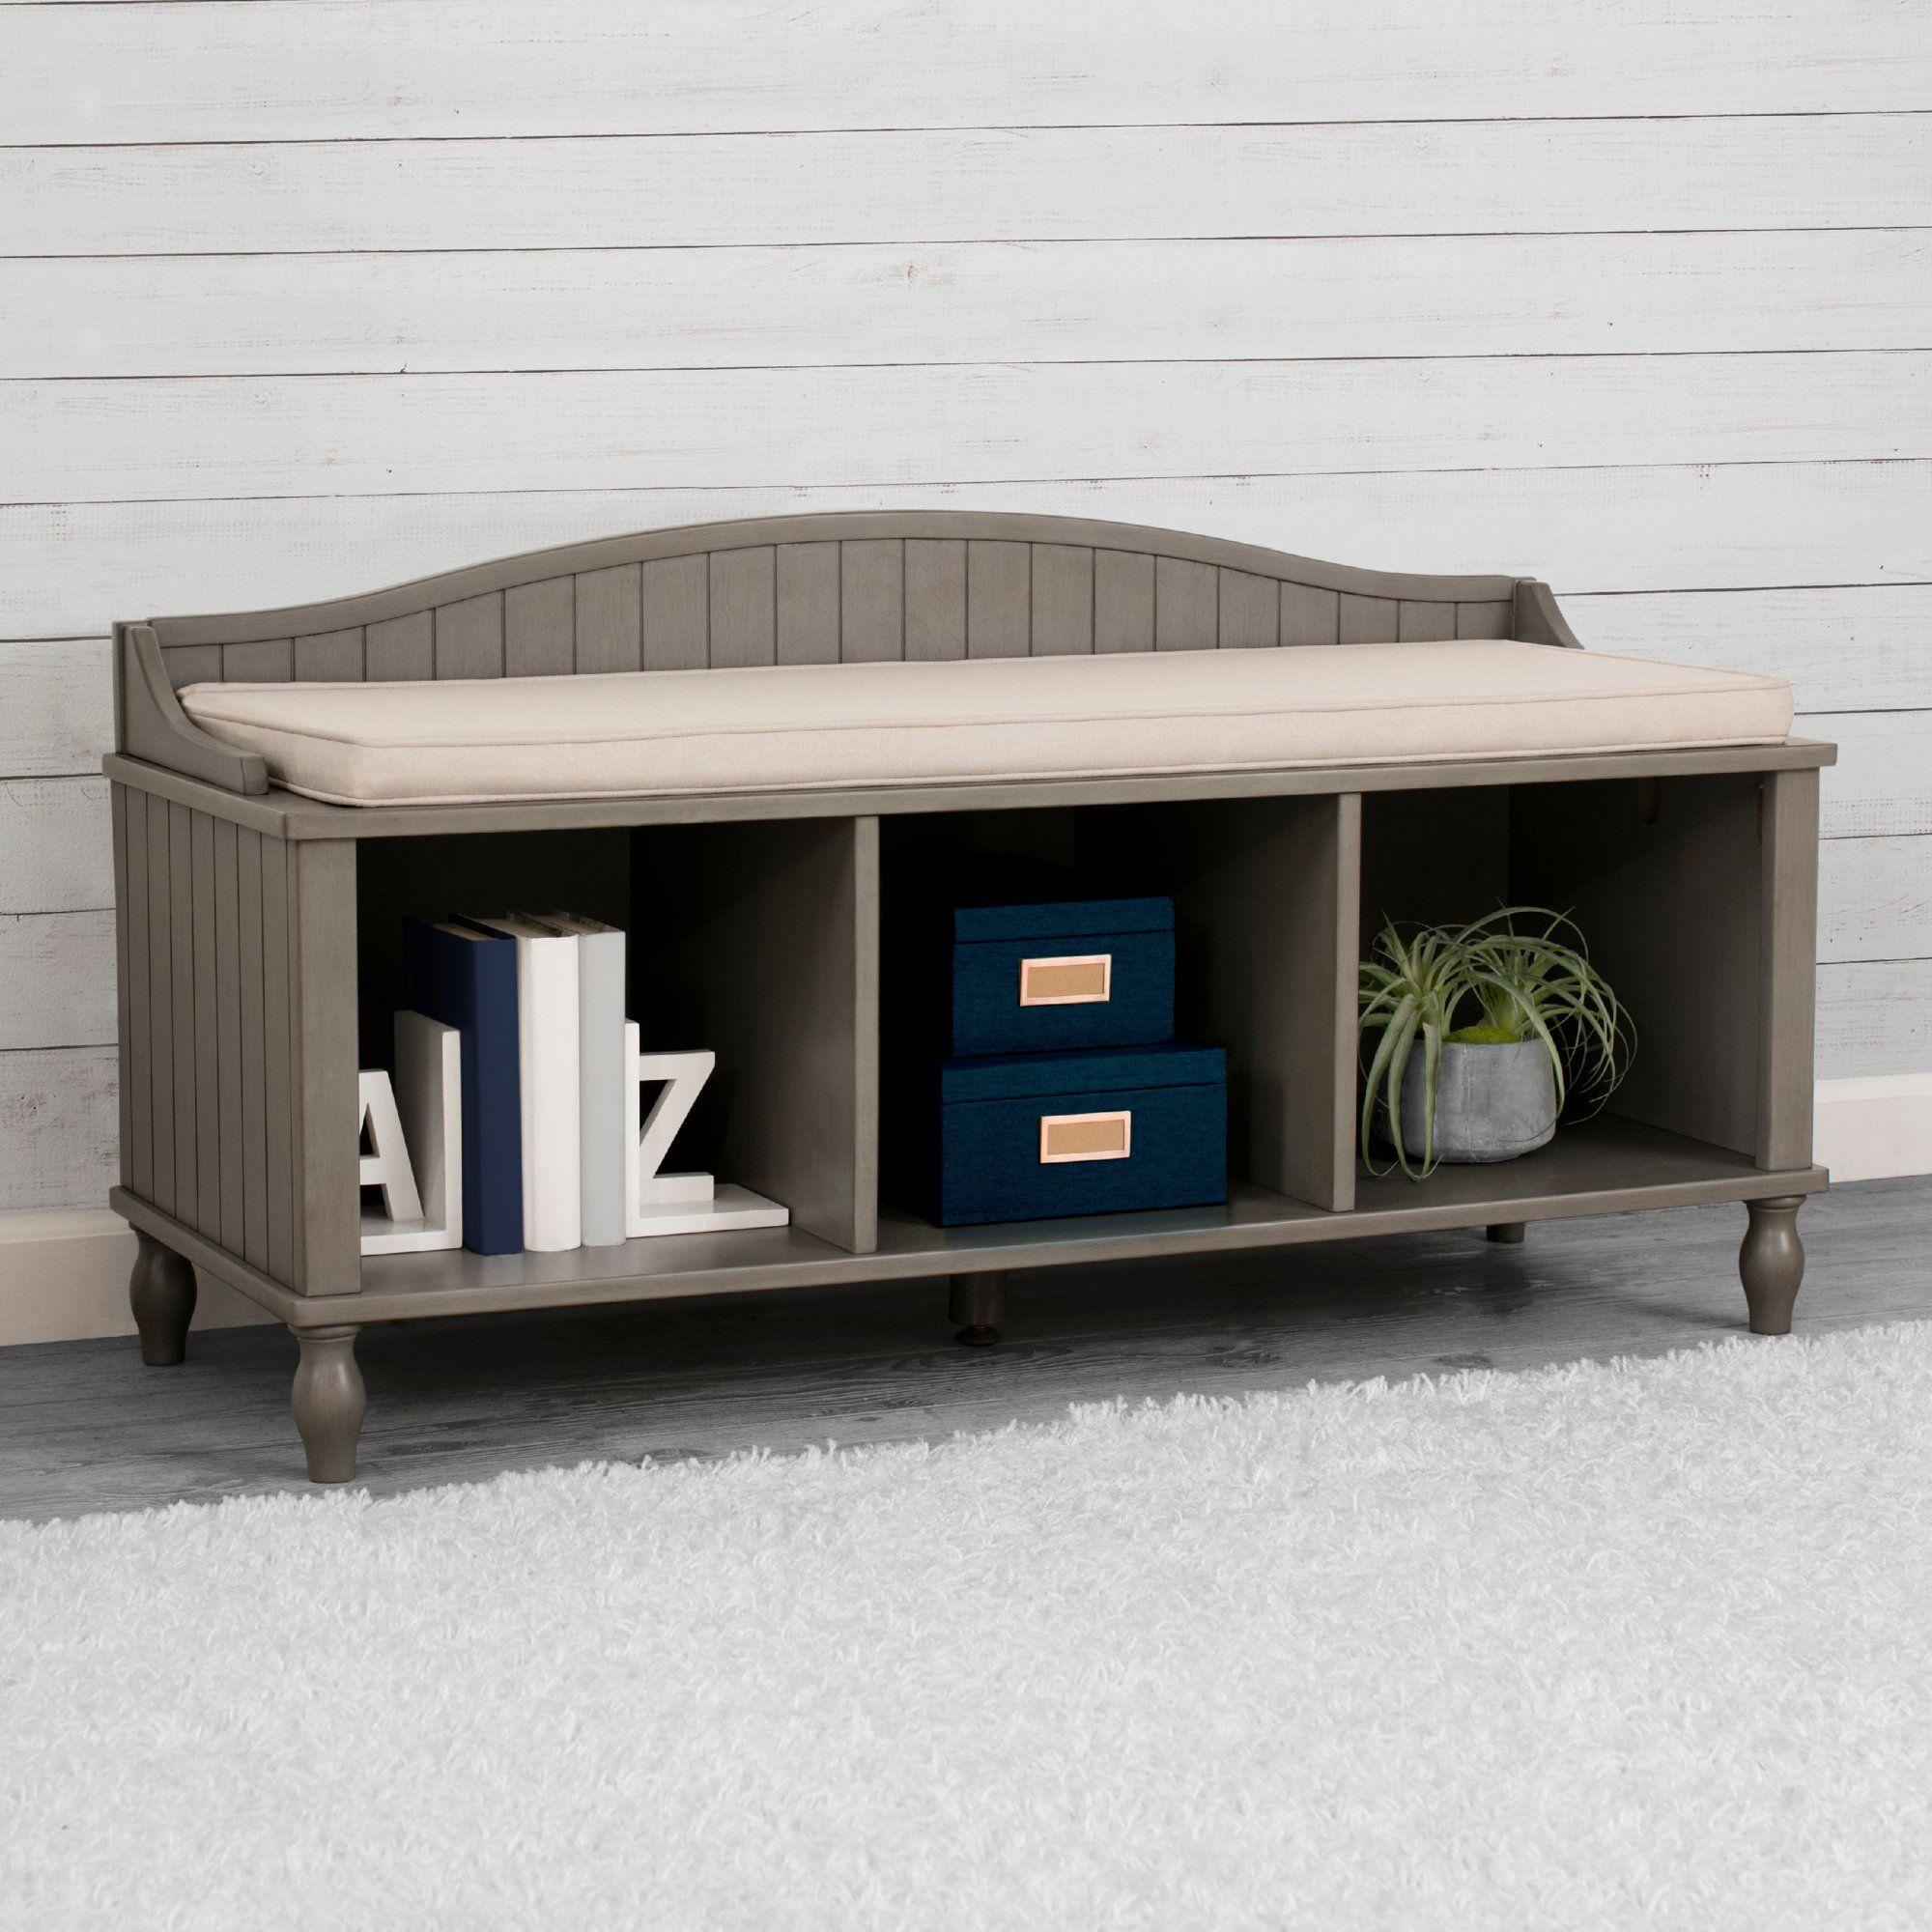 77371d2e58465f4d7d65fd0938263f84 - Better Homes And Gardens Bench Seat